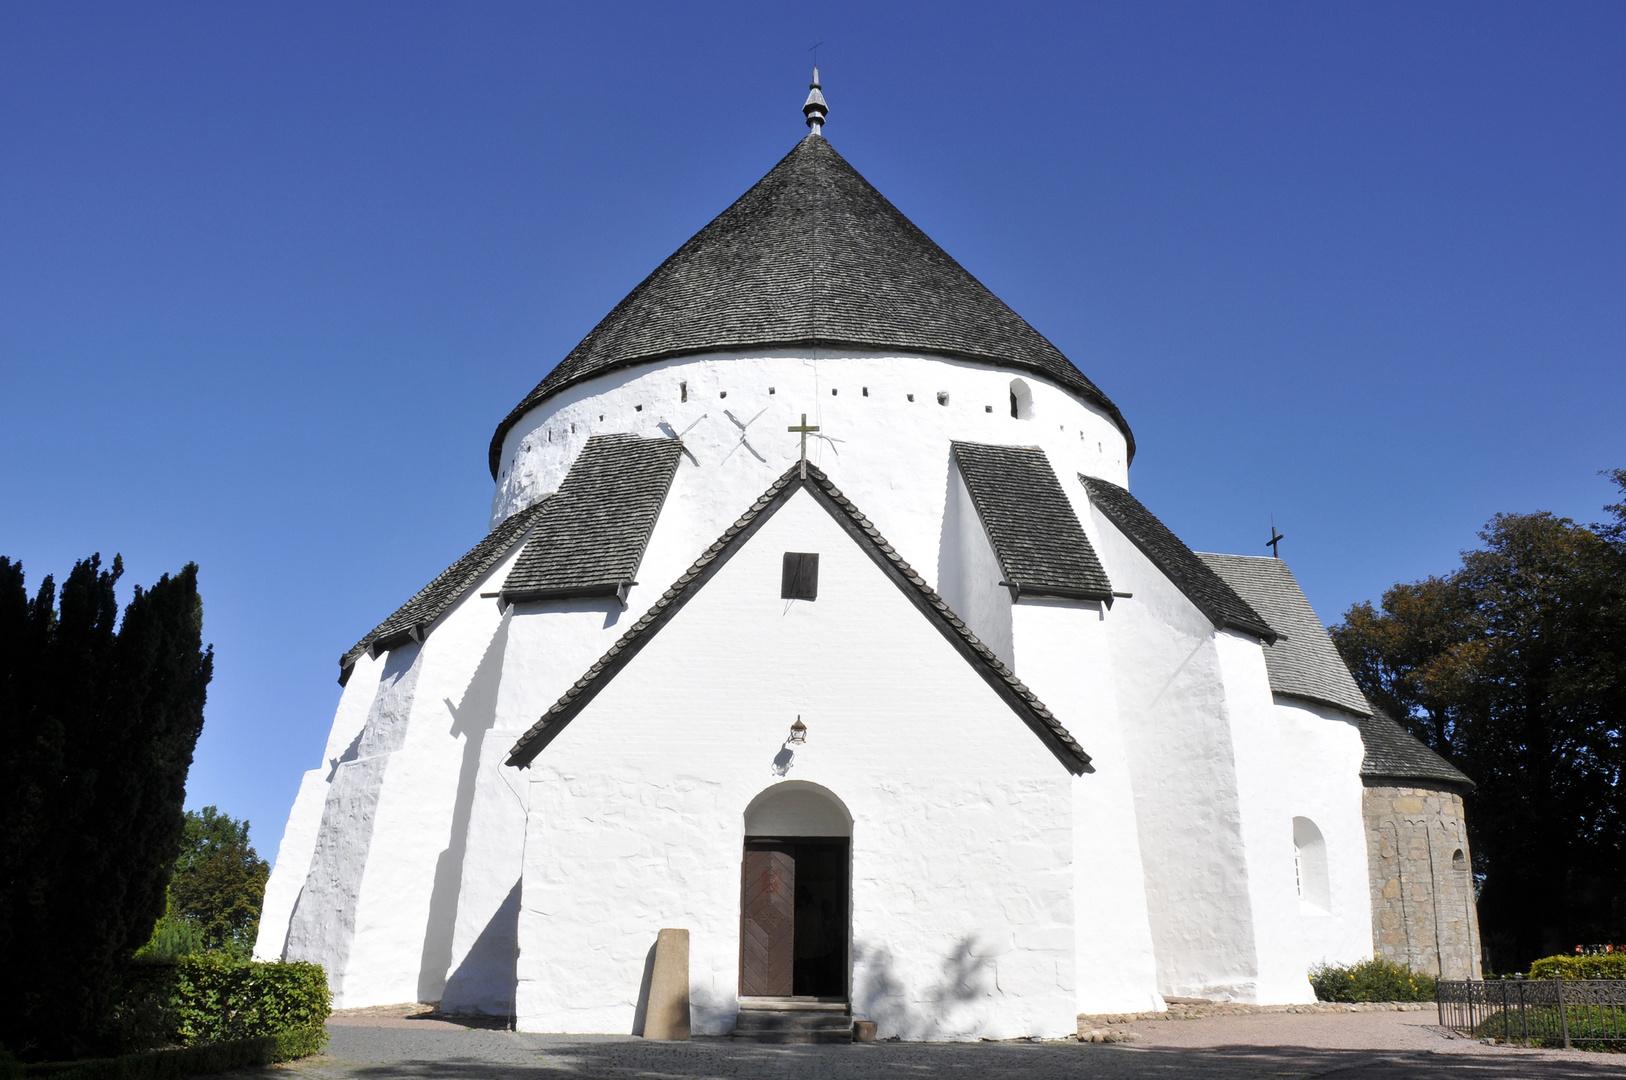 Oesterlars Kirke